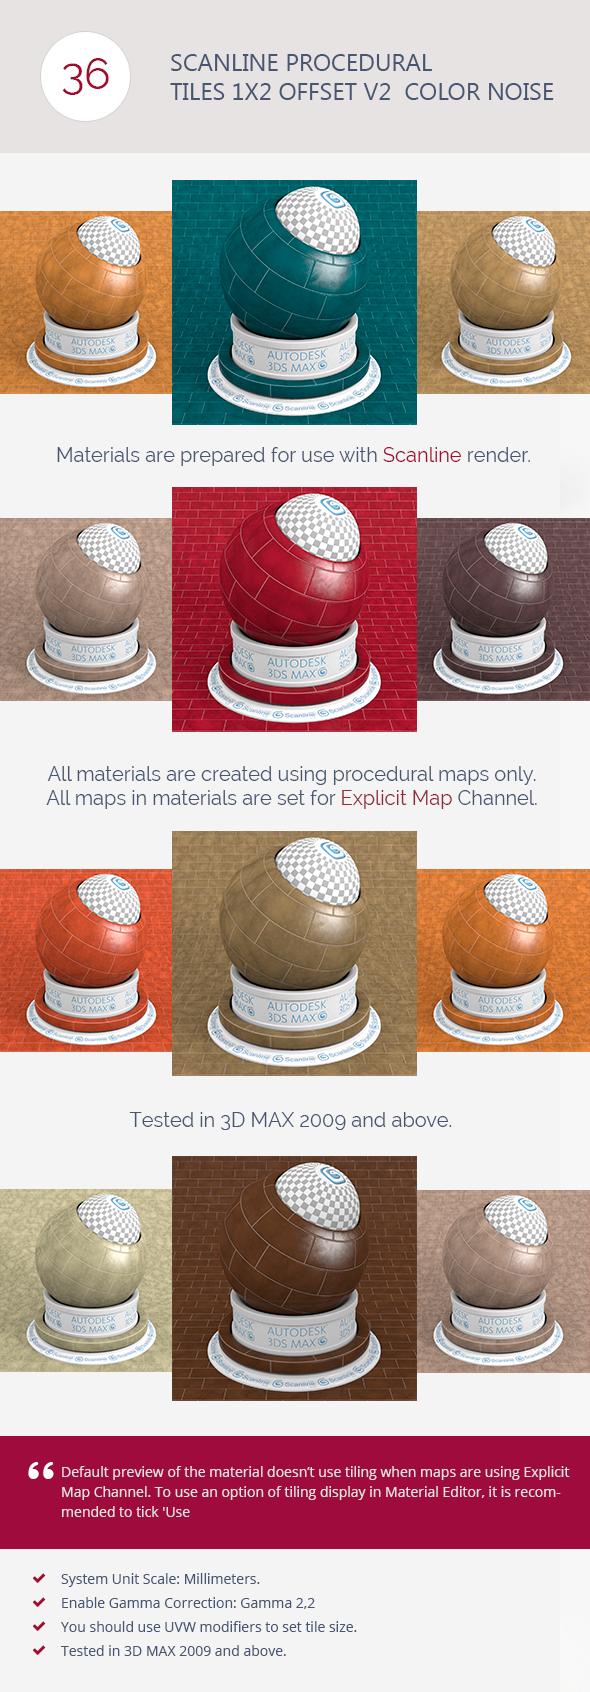 3DOcean Scanline Proc Tiles 1x2 Offset V2 Color Noi 6744497